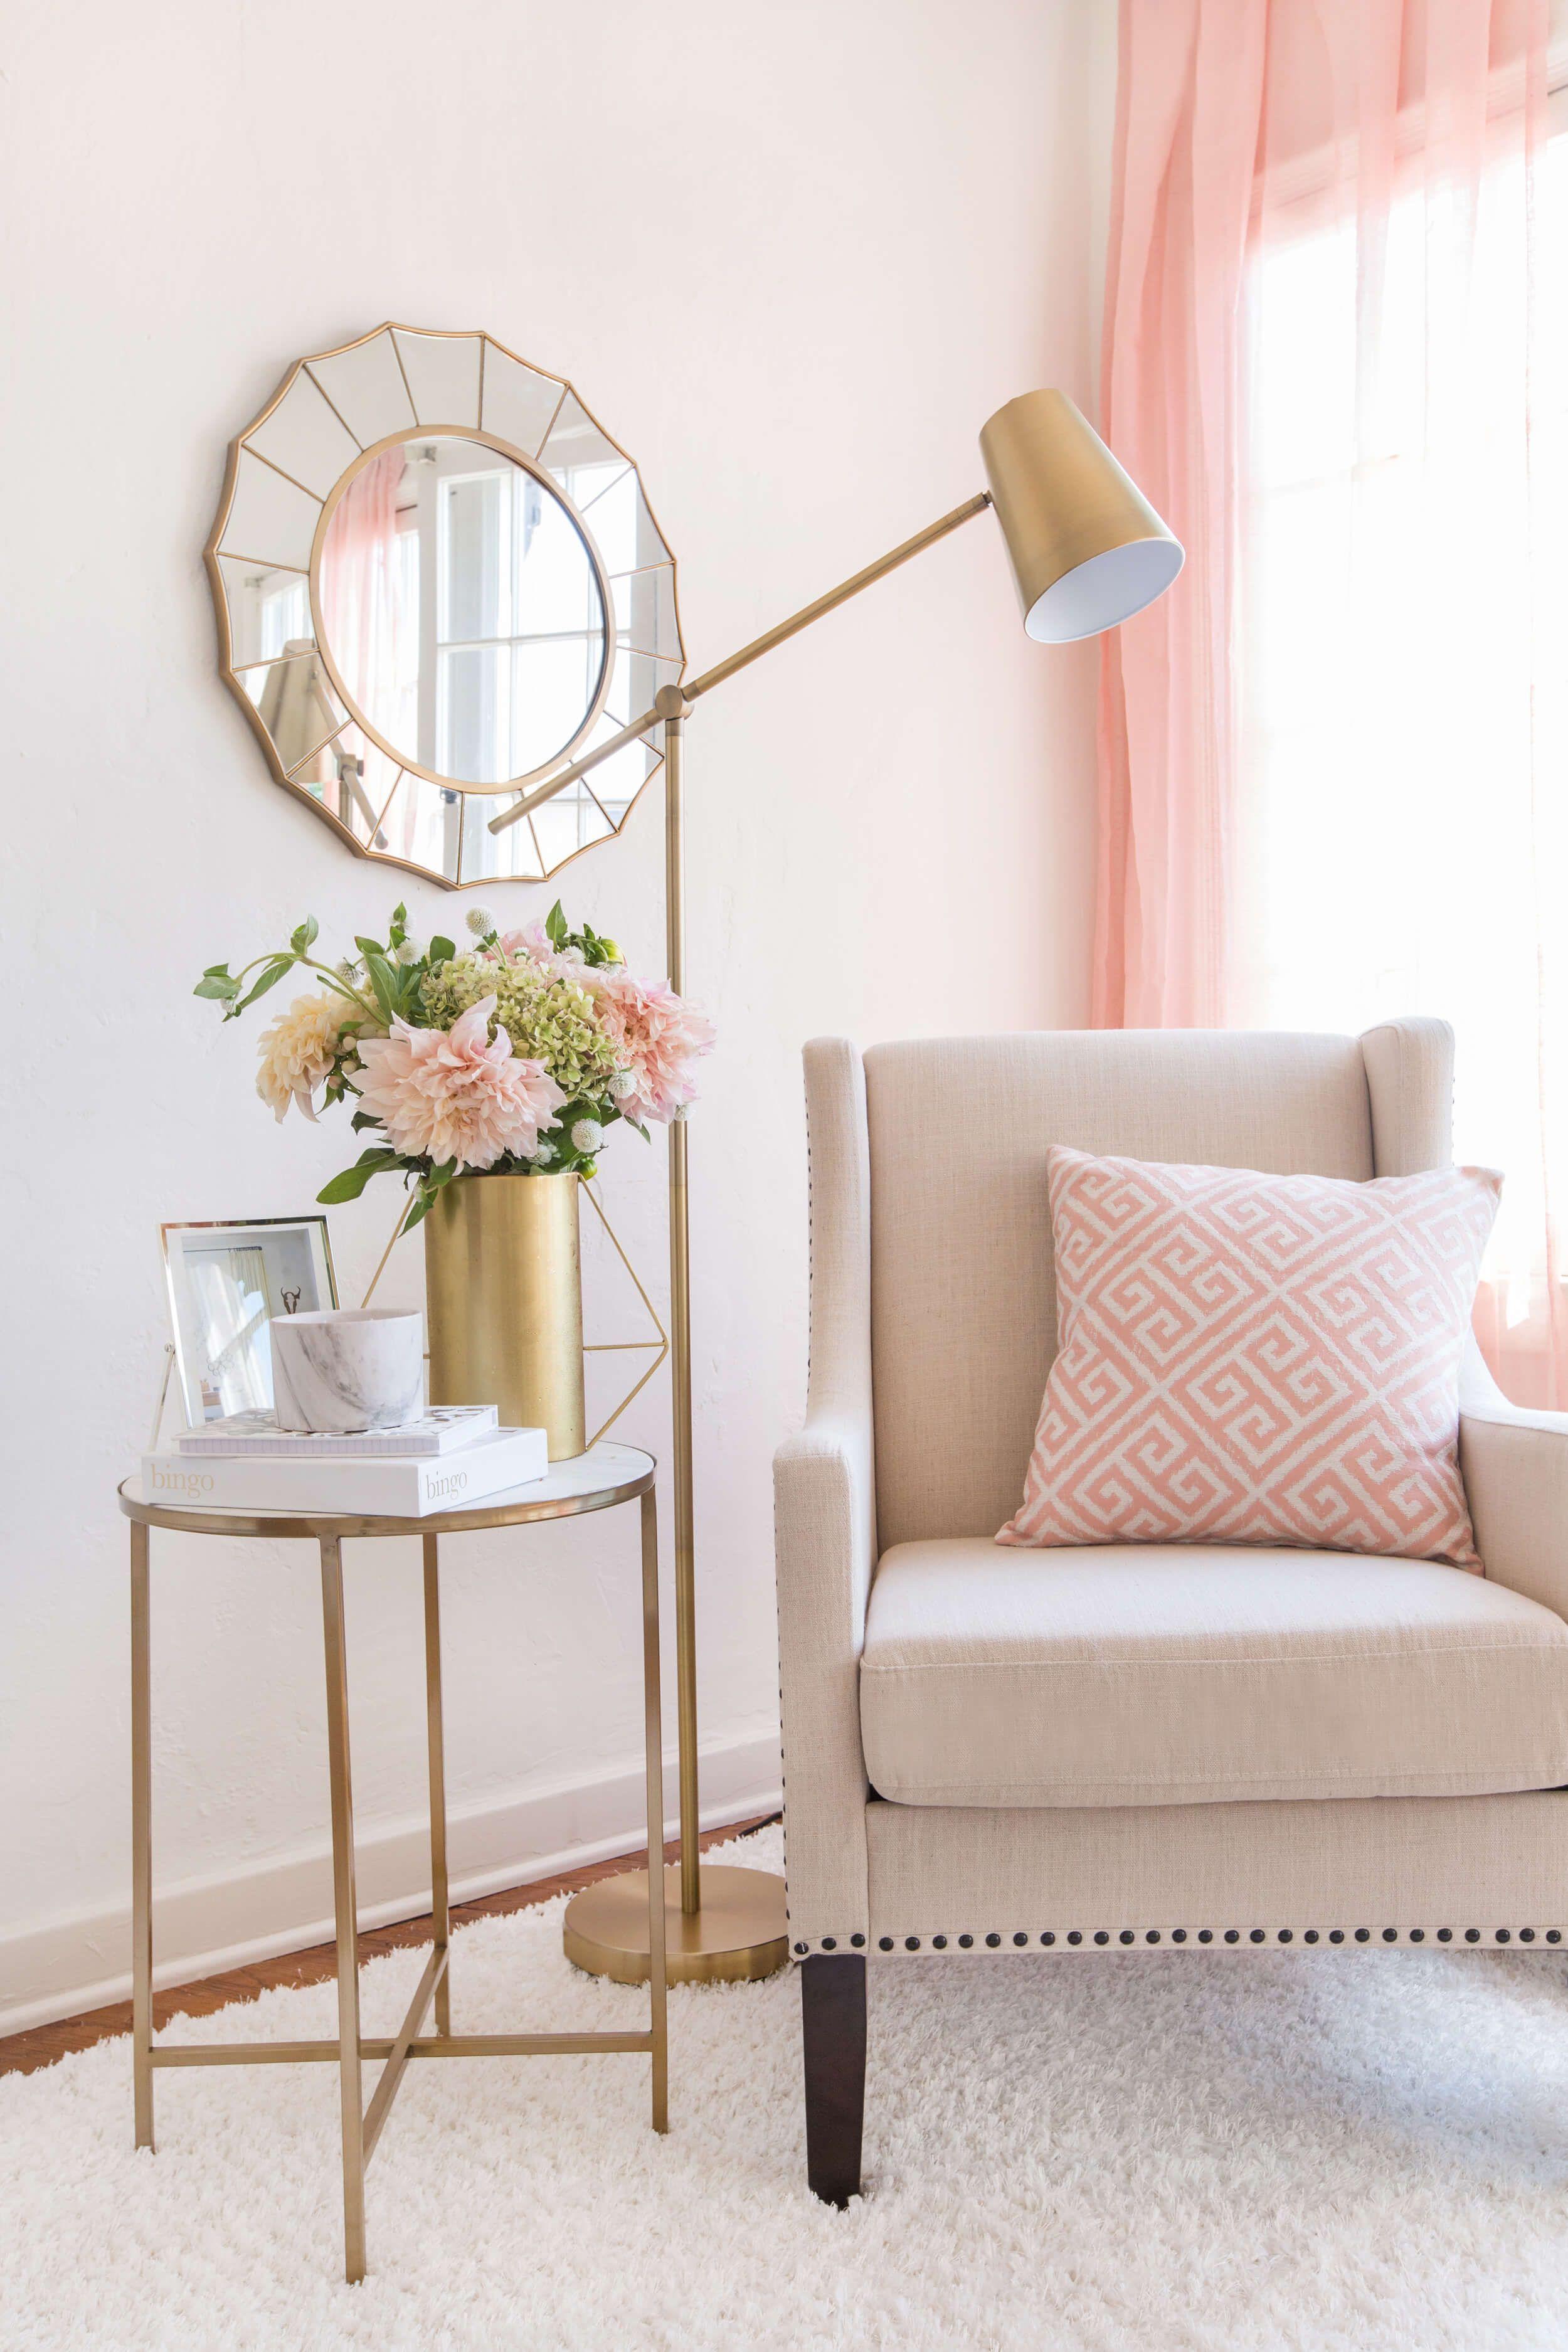 #bedroom decor design images #60s bedroom decor #bedroom decor for guys #bedroom... ,  #60s #Bedroom #Decor #Design #GUYS #Images #marbledesign #marbletexture #orangemarble #whitemarble